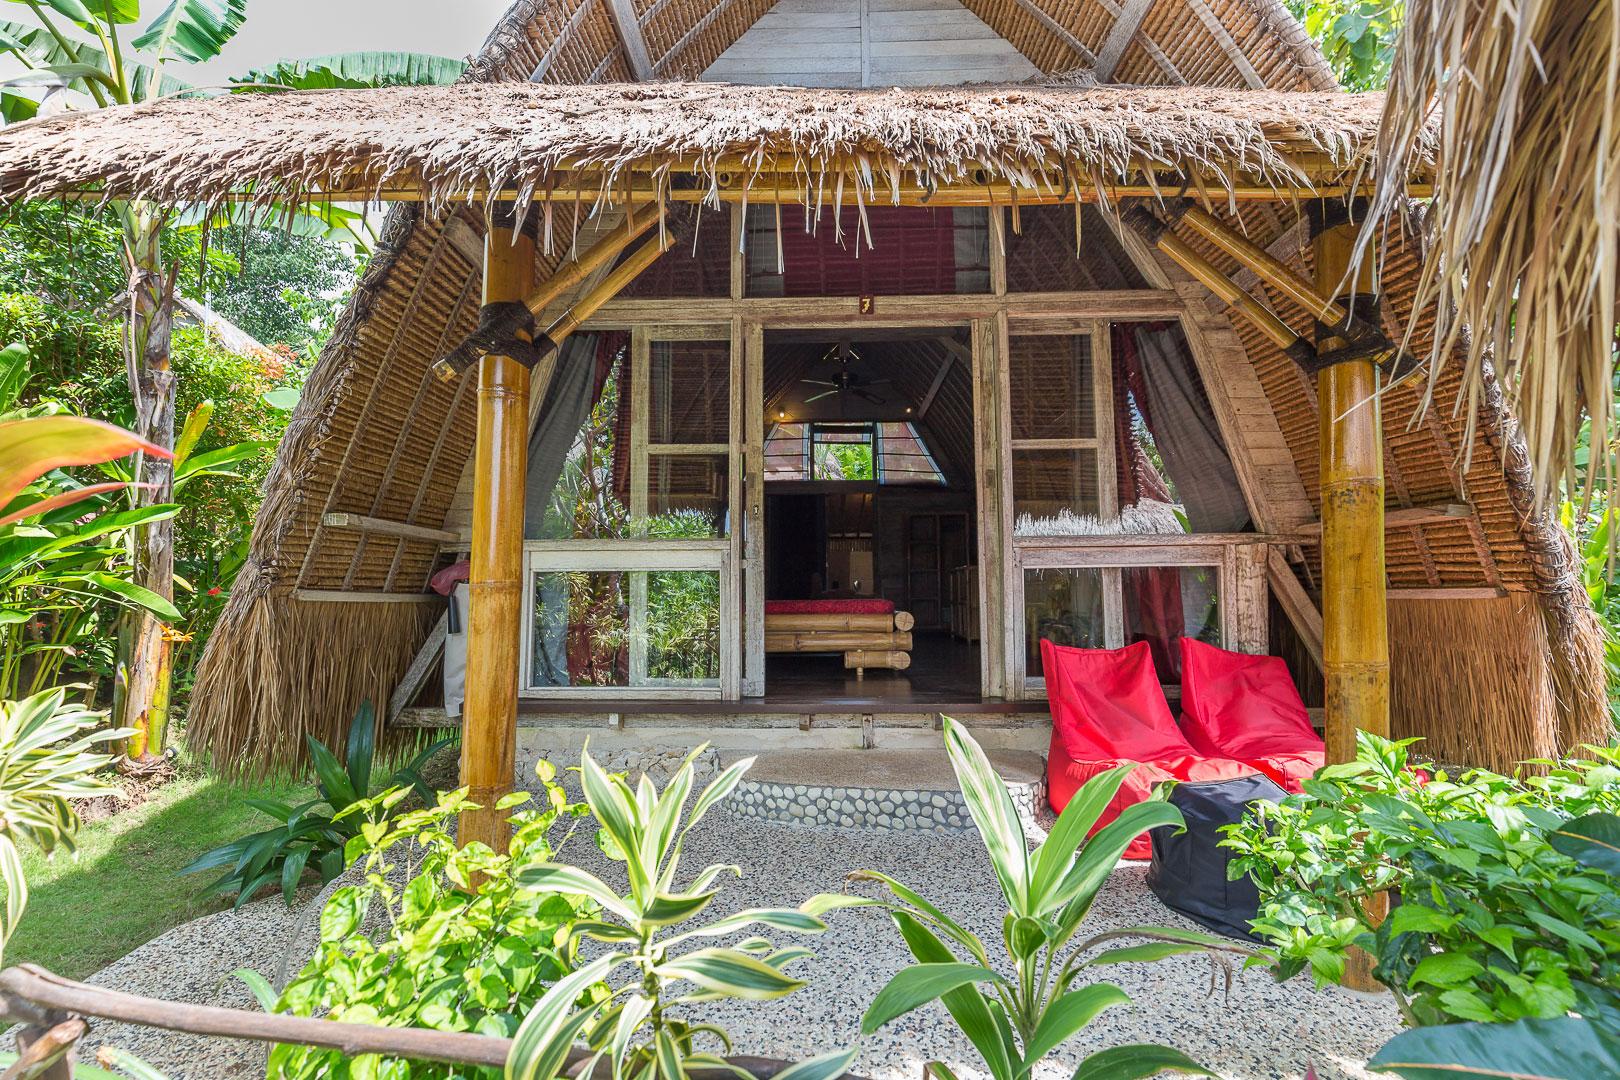 Location-bungalows-maison-hote-hotel-milos-home-L7-rhodochrosite-9